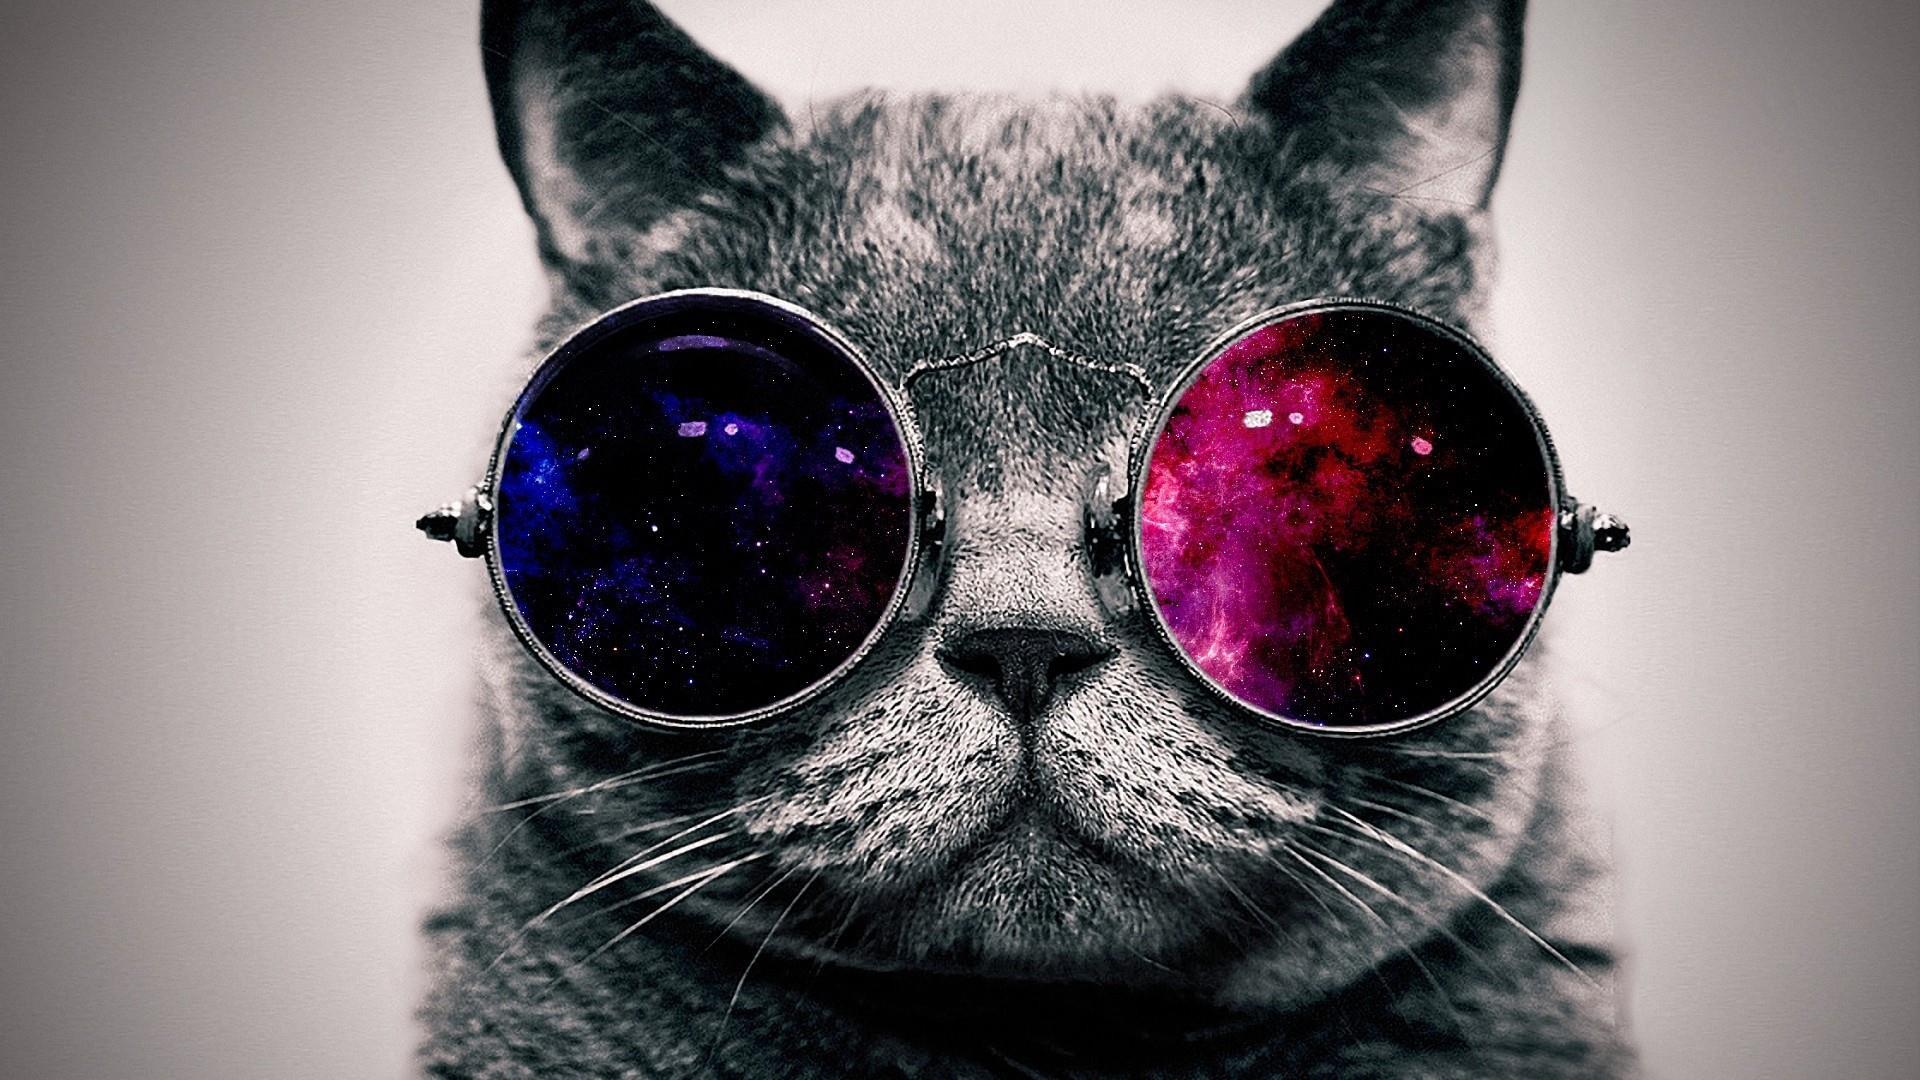 Funny cat in sunglasses wallpaper